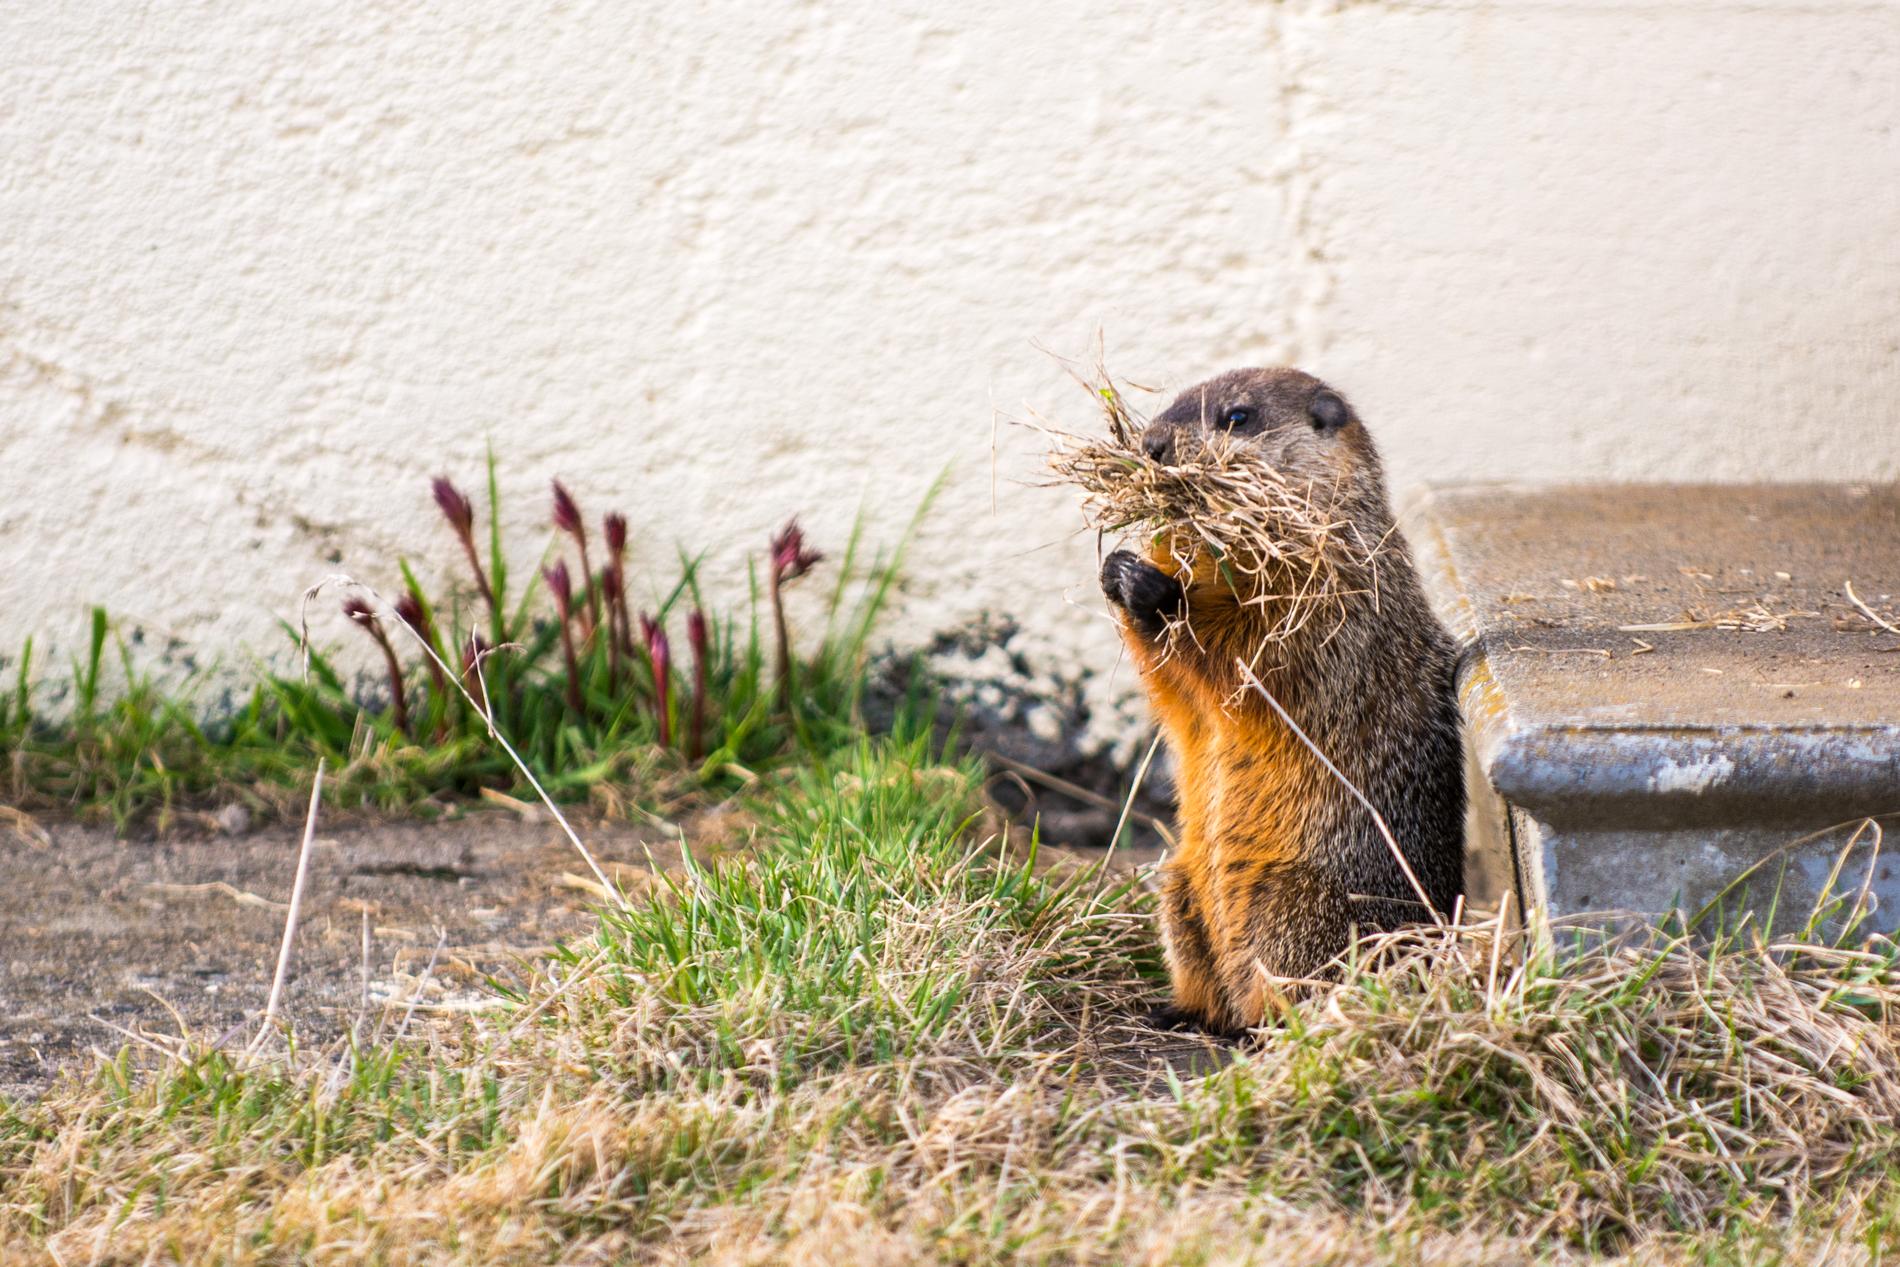 Groundhog nesting